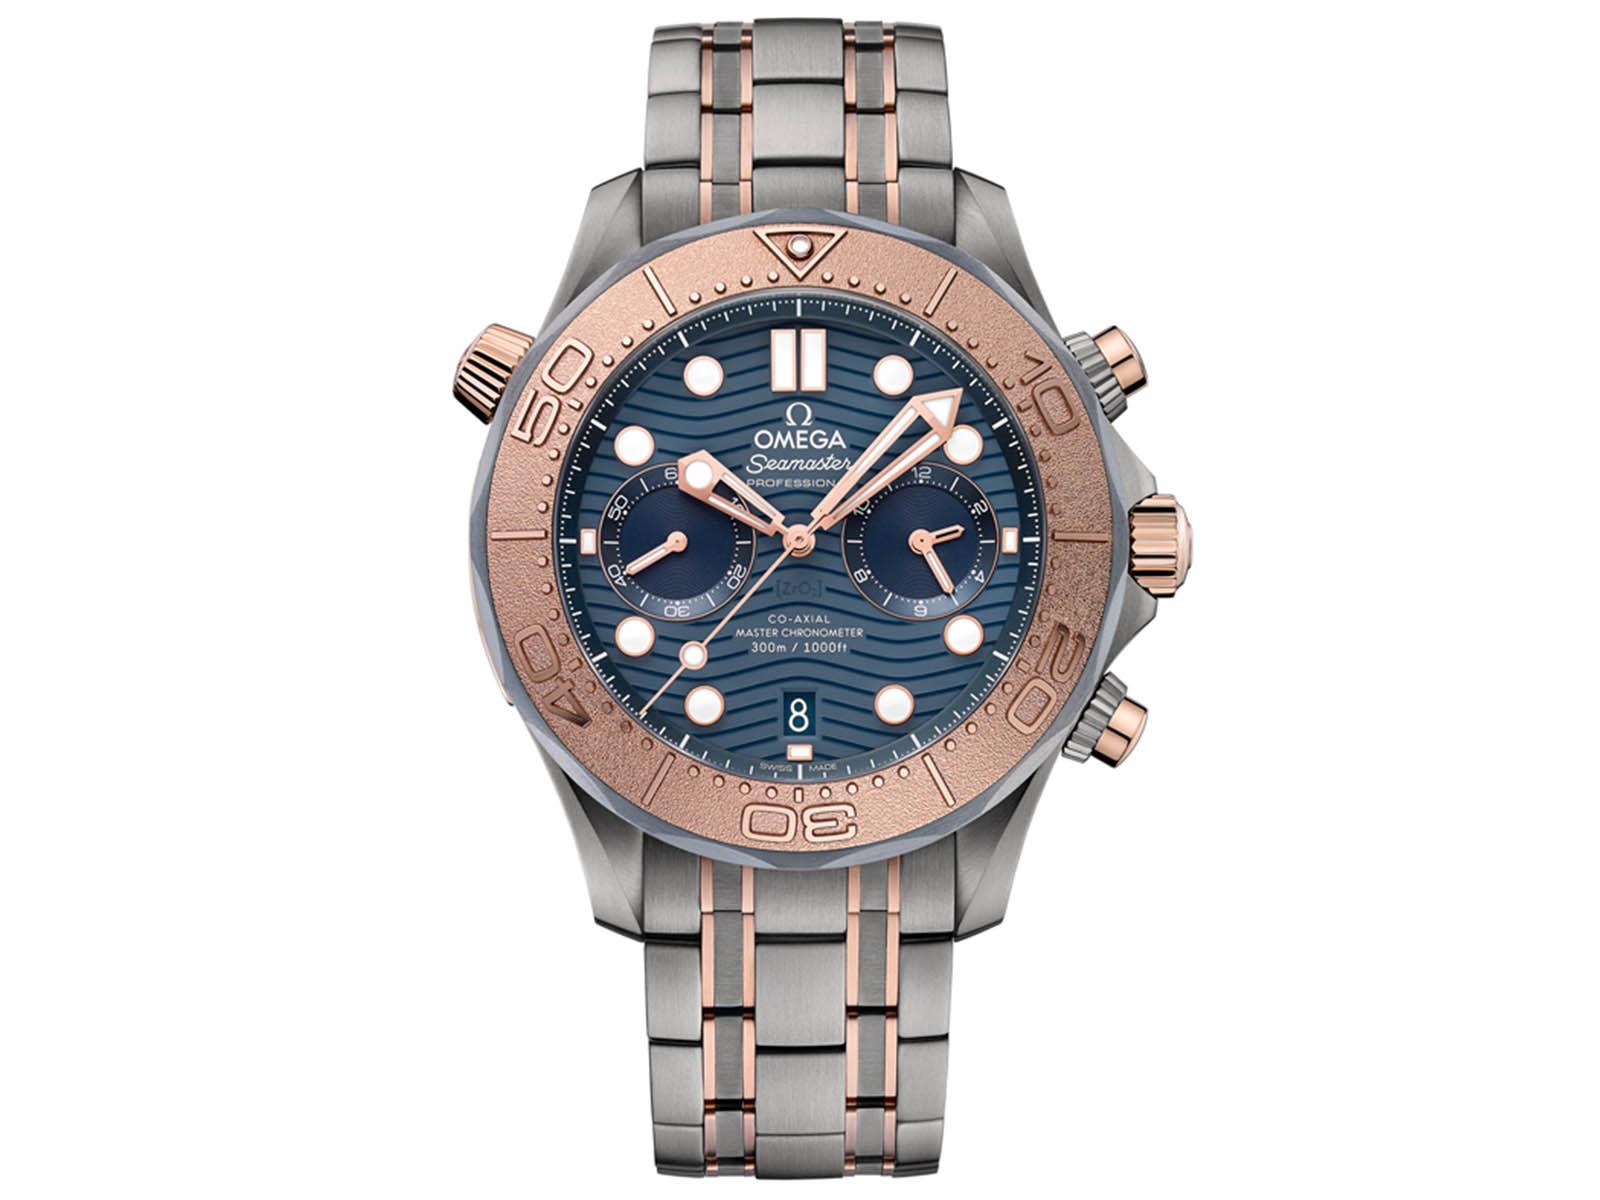 omega-seamaster-diver-300m-chronograph-gold-titanium-tantalum-8.jpg